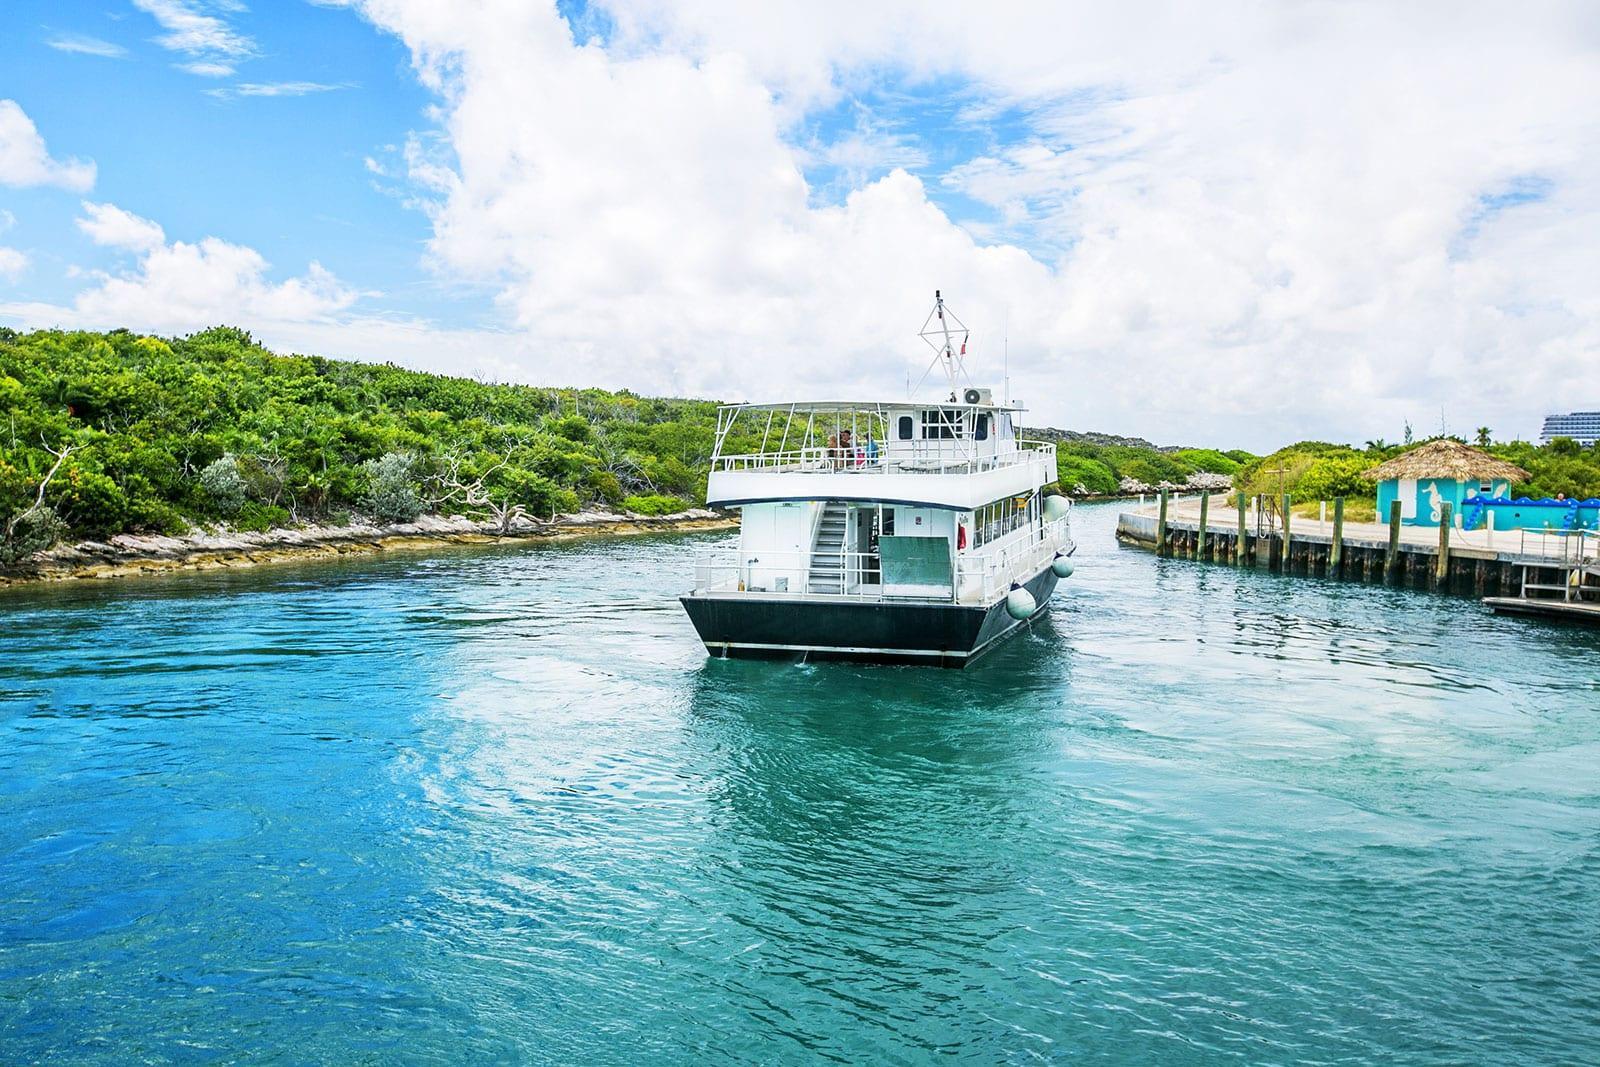 Tagesausflug auf die Bahamas